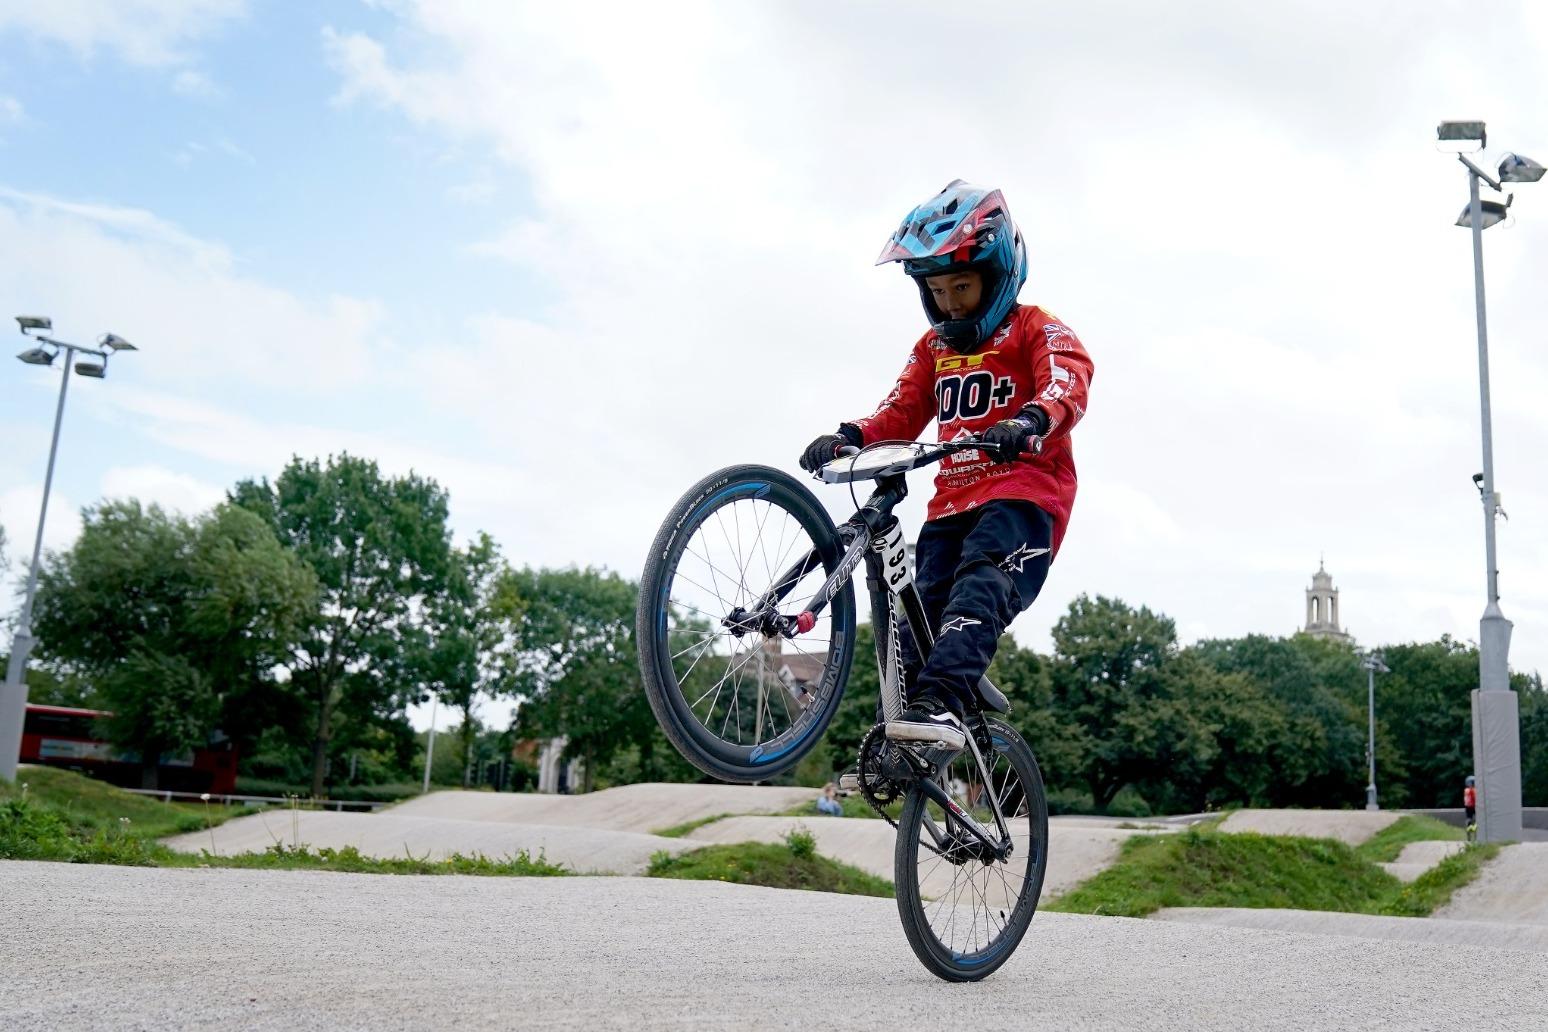 BMX club 'proud' of Peckham Olympic hero Kye Whyte